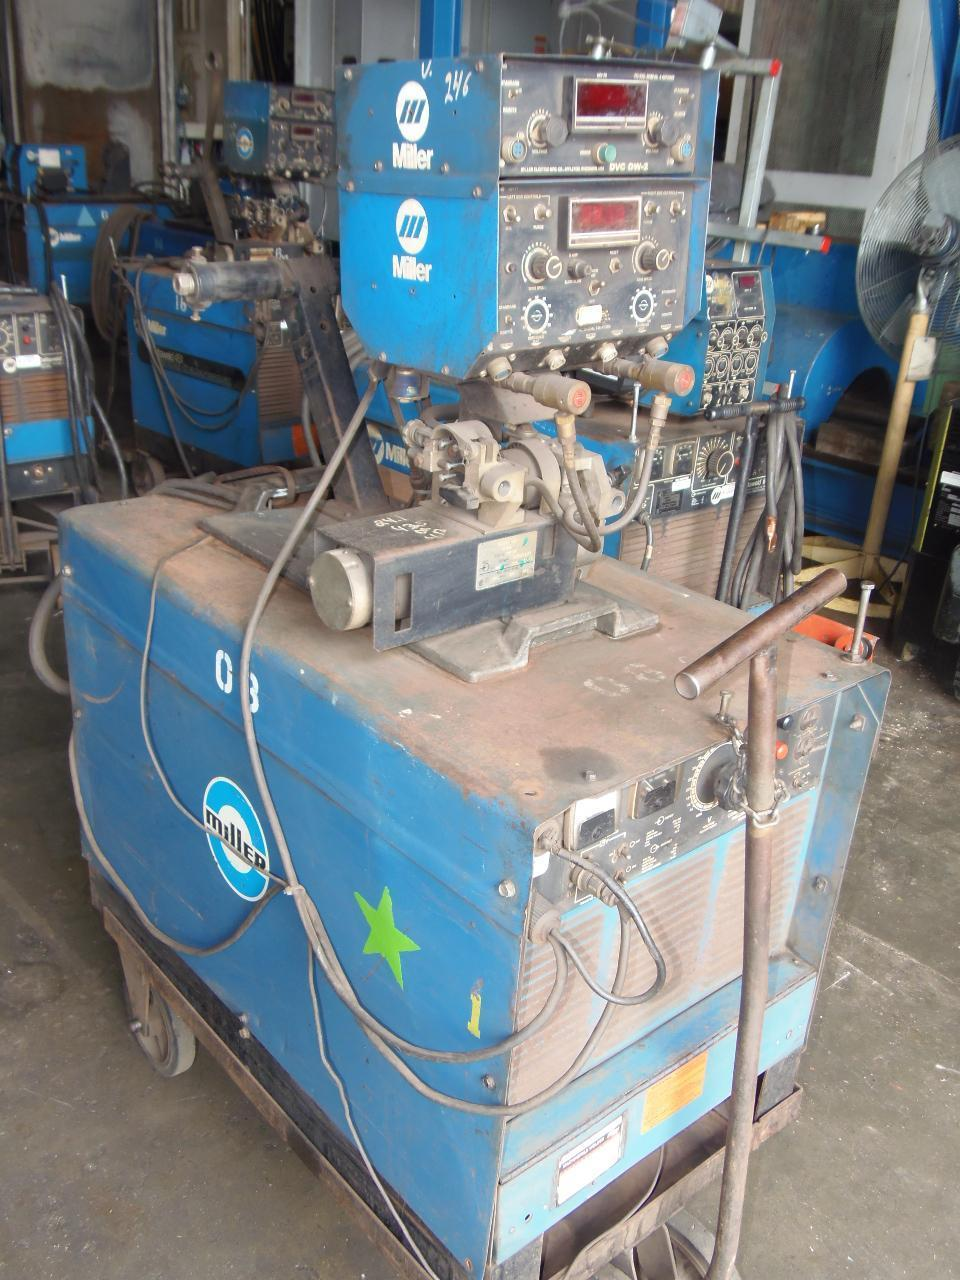 Miller 650 Amp Wire Feed Welder, Model Deltaweld 650 with D52D Wire feeder